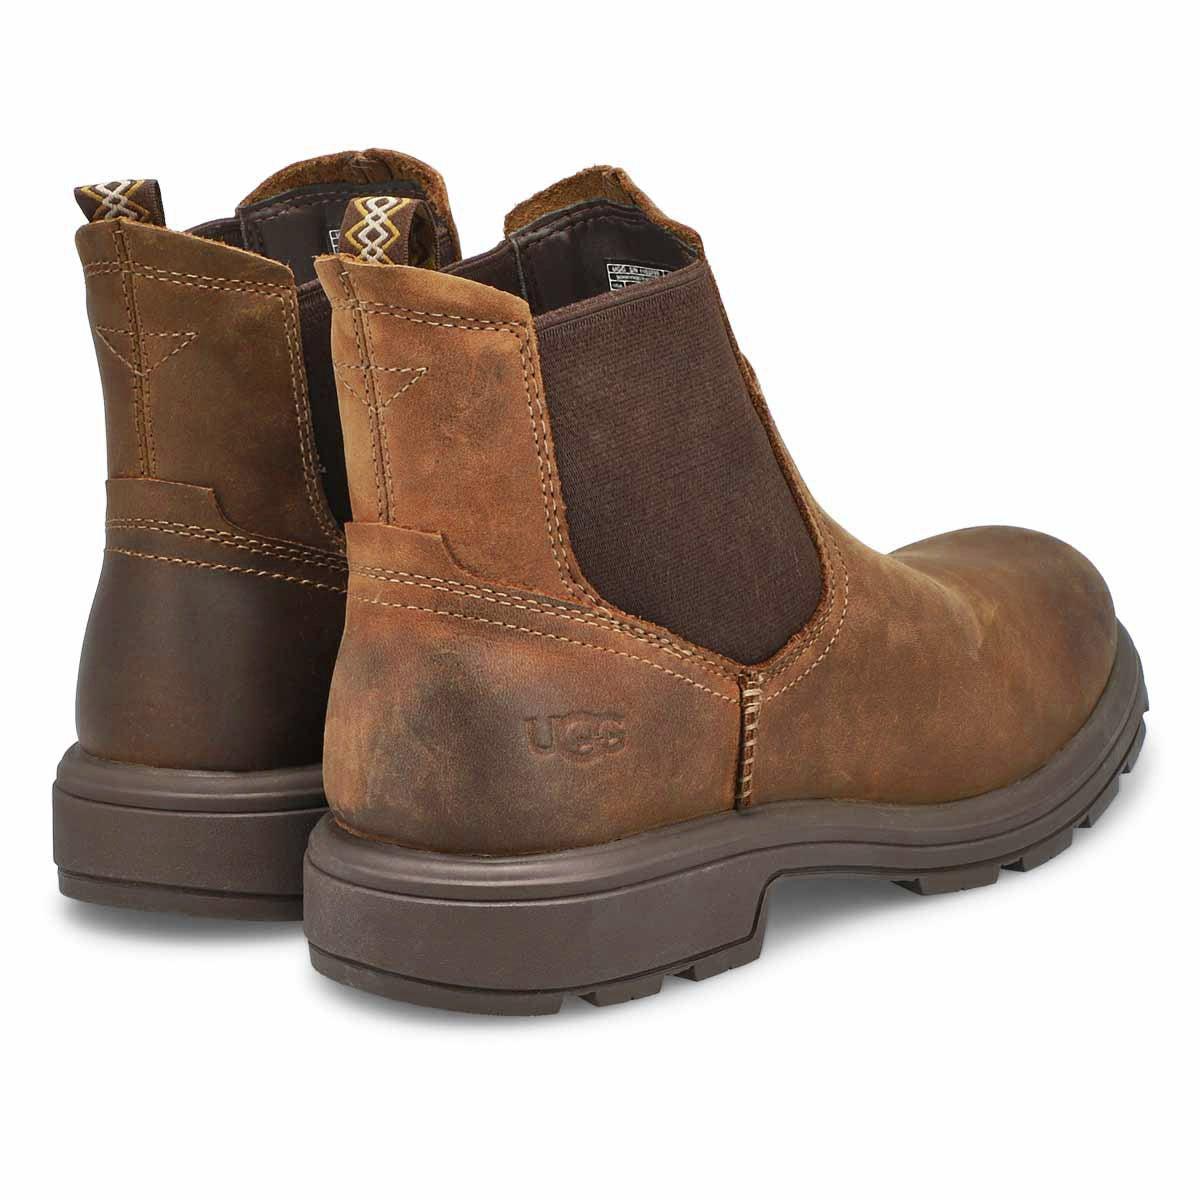 Mns Biltmore oak wtpf chelsea boot